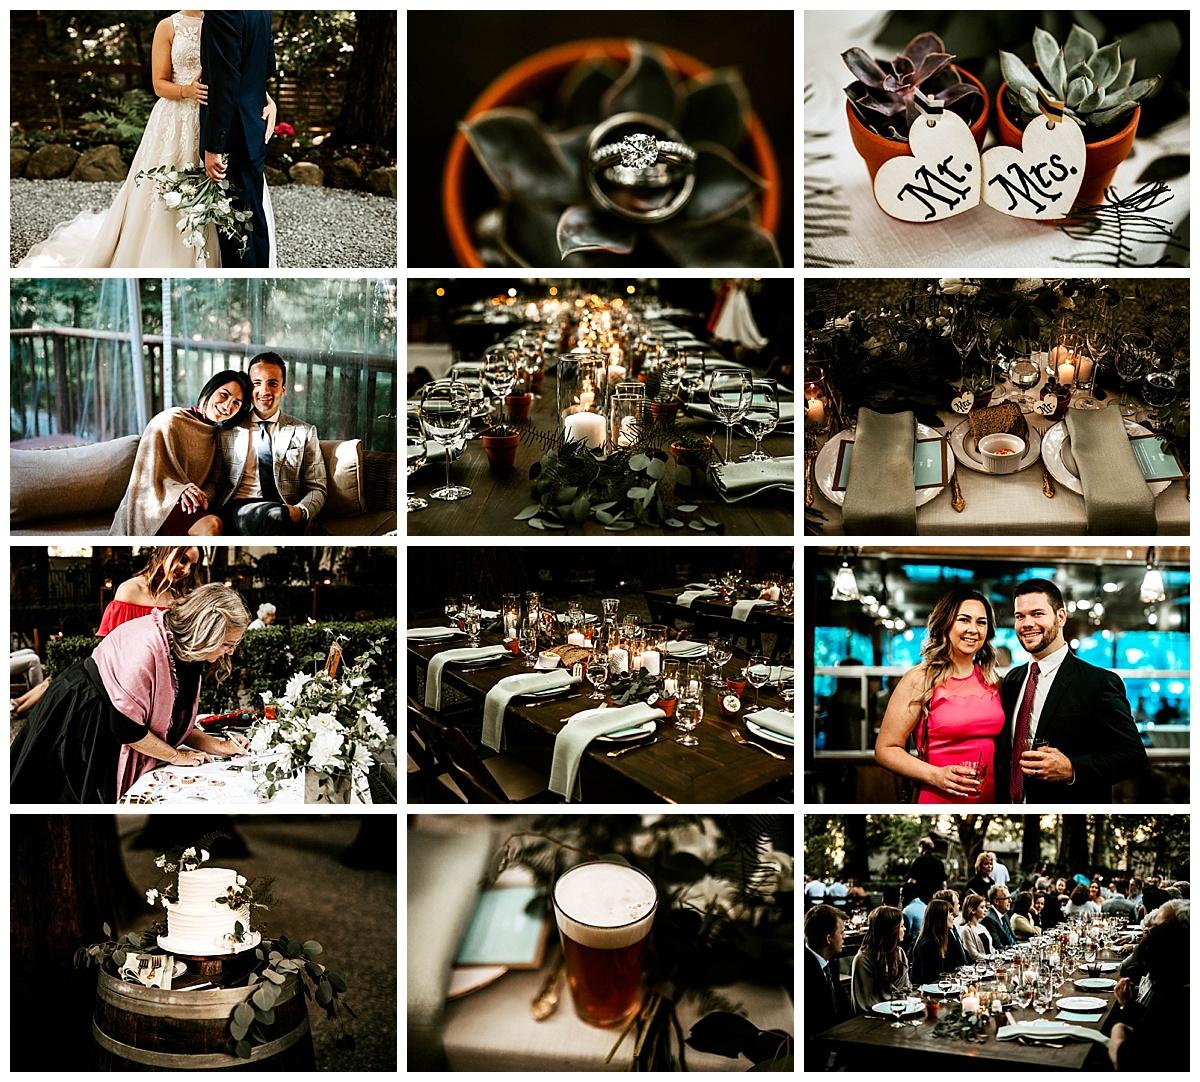 San Francisco Wedding details